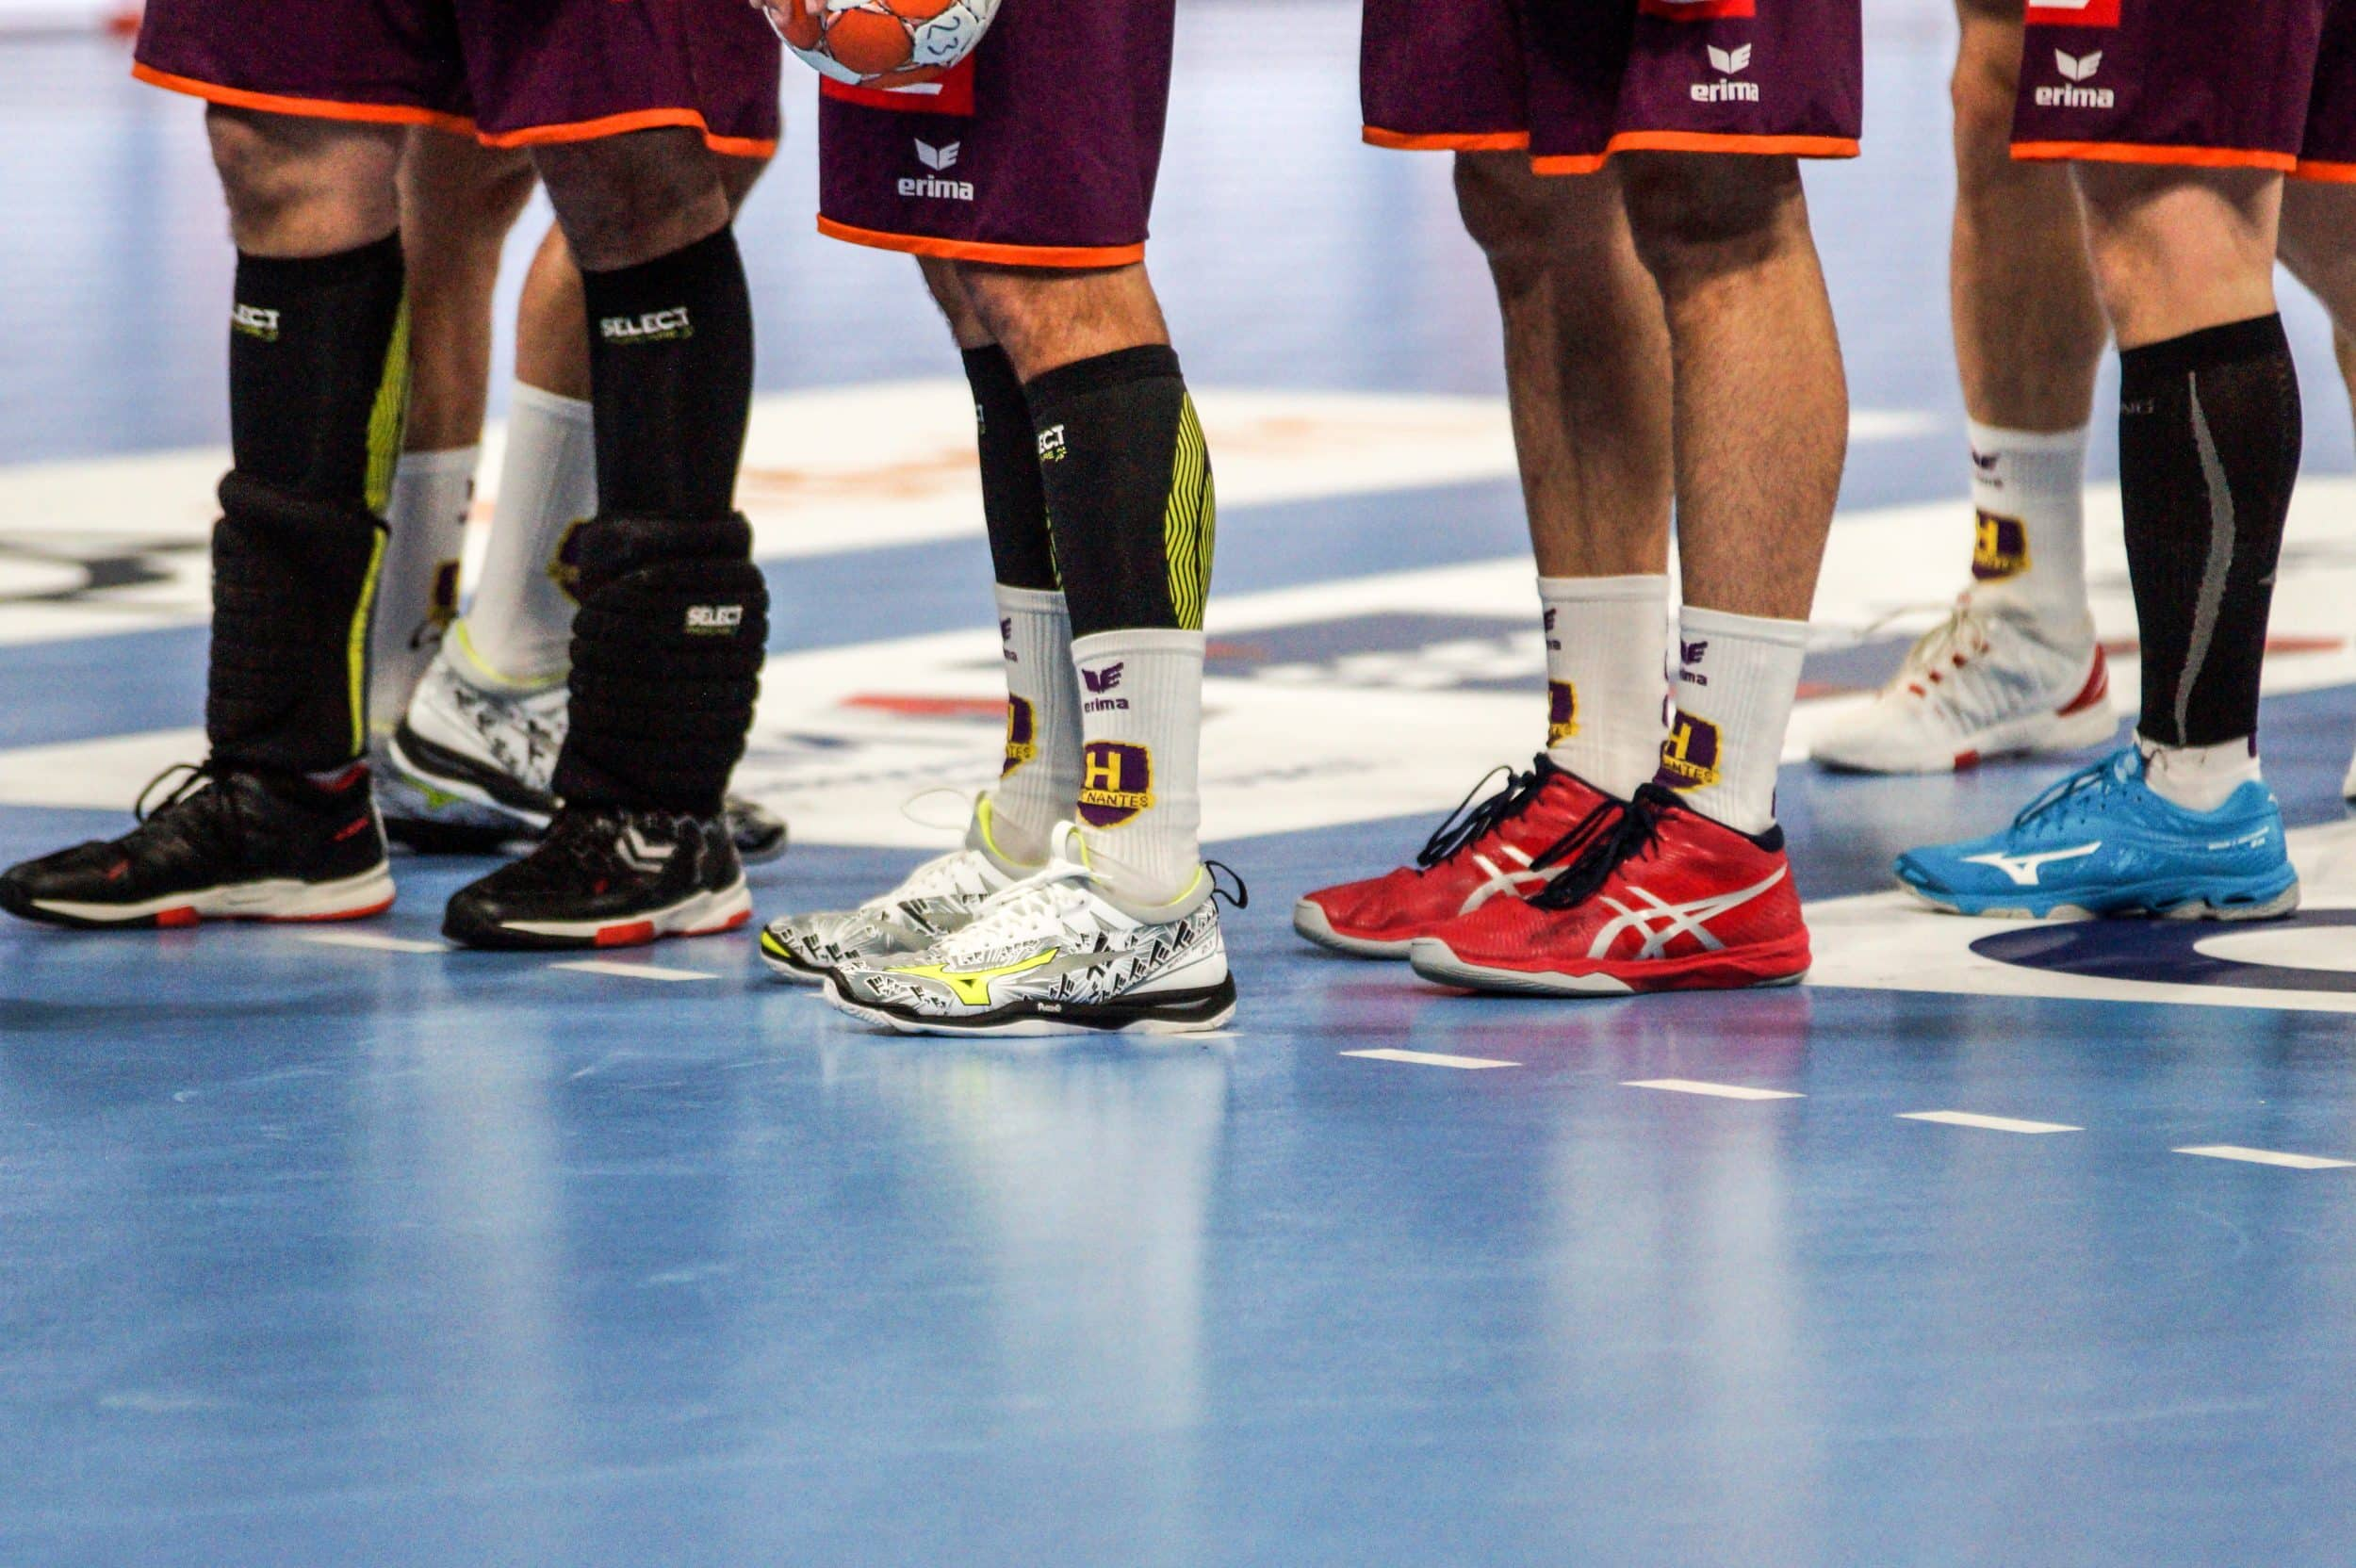 Hb Homme Handball Adidas Spezial Performance Indoor